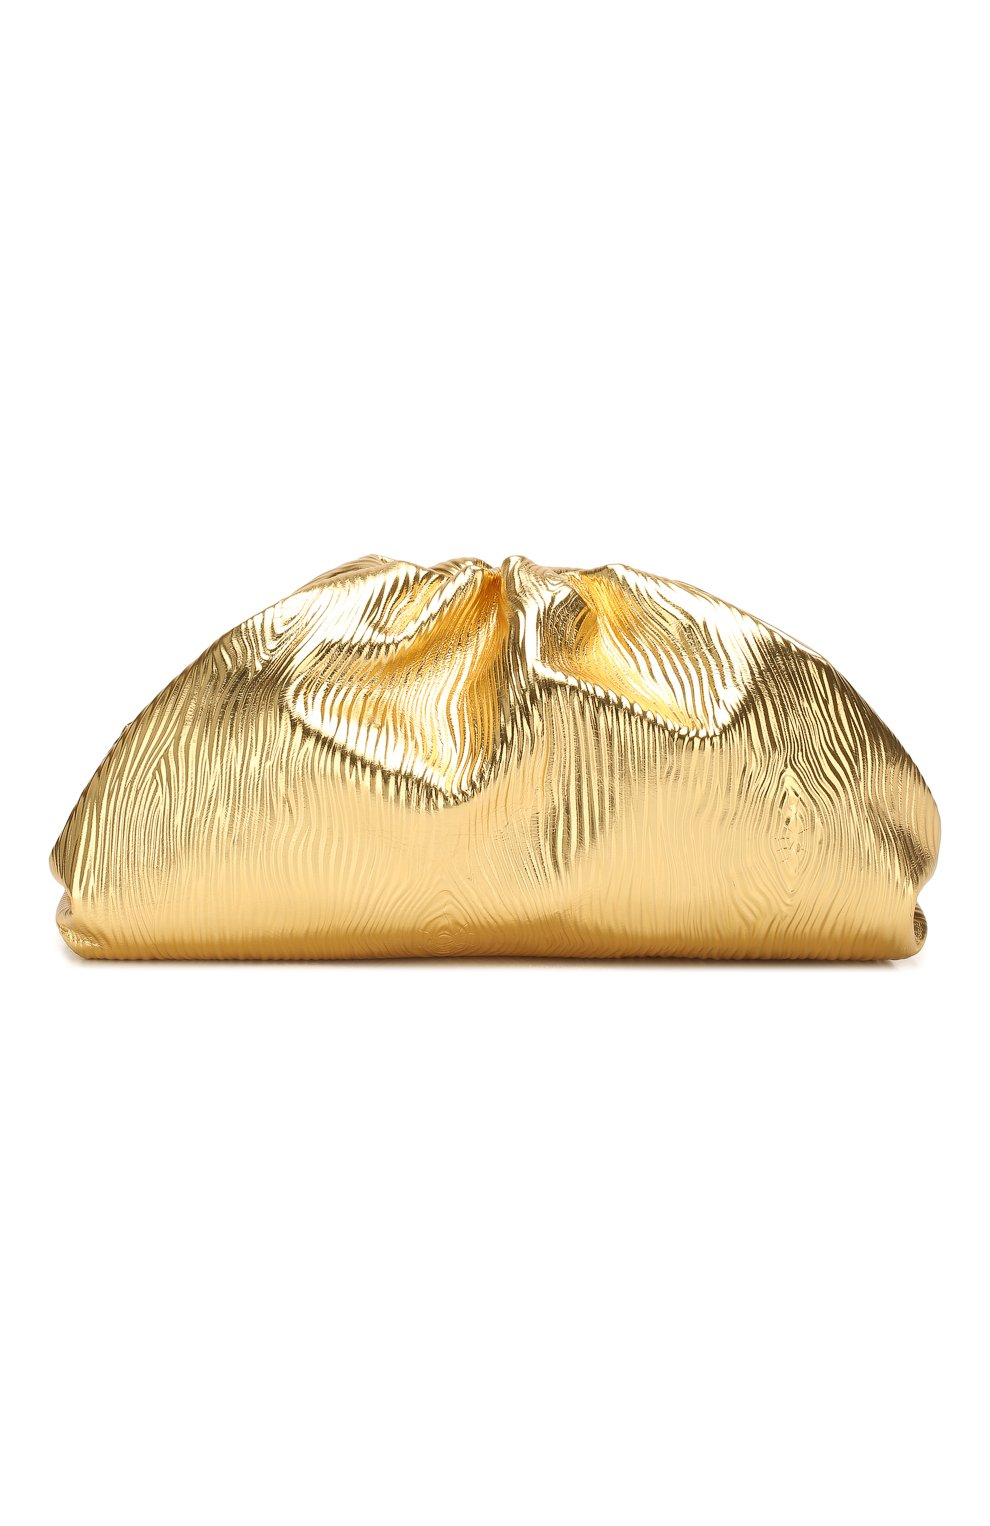 Женский клатч pouch BOTTEGA VENETA золотого цвета, арт. 618128/VCQ60 | Фото 1